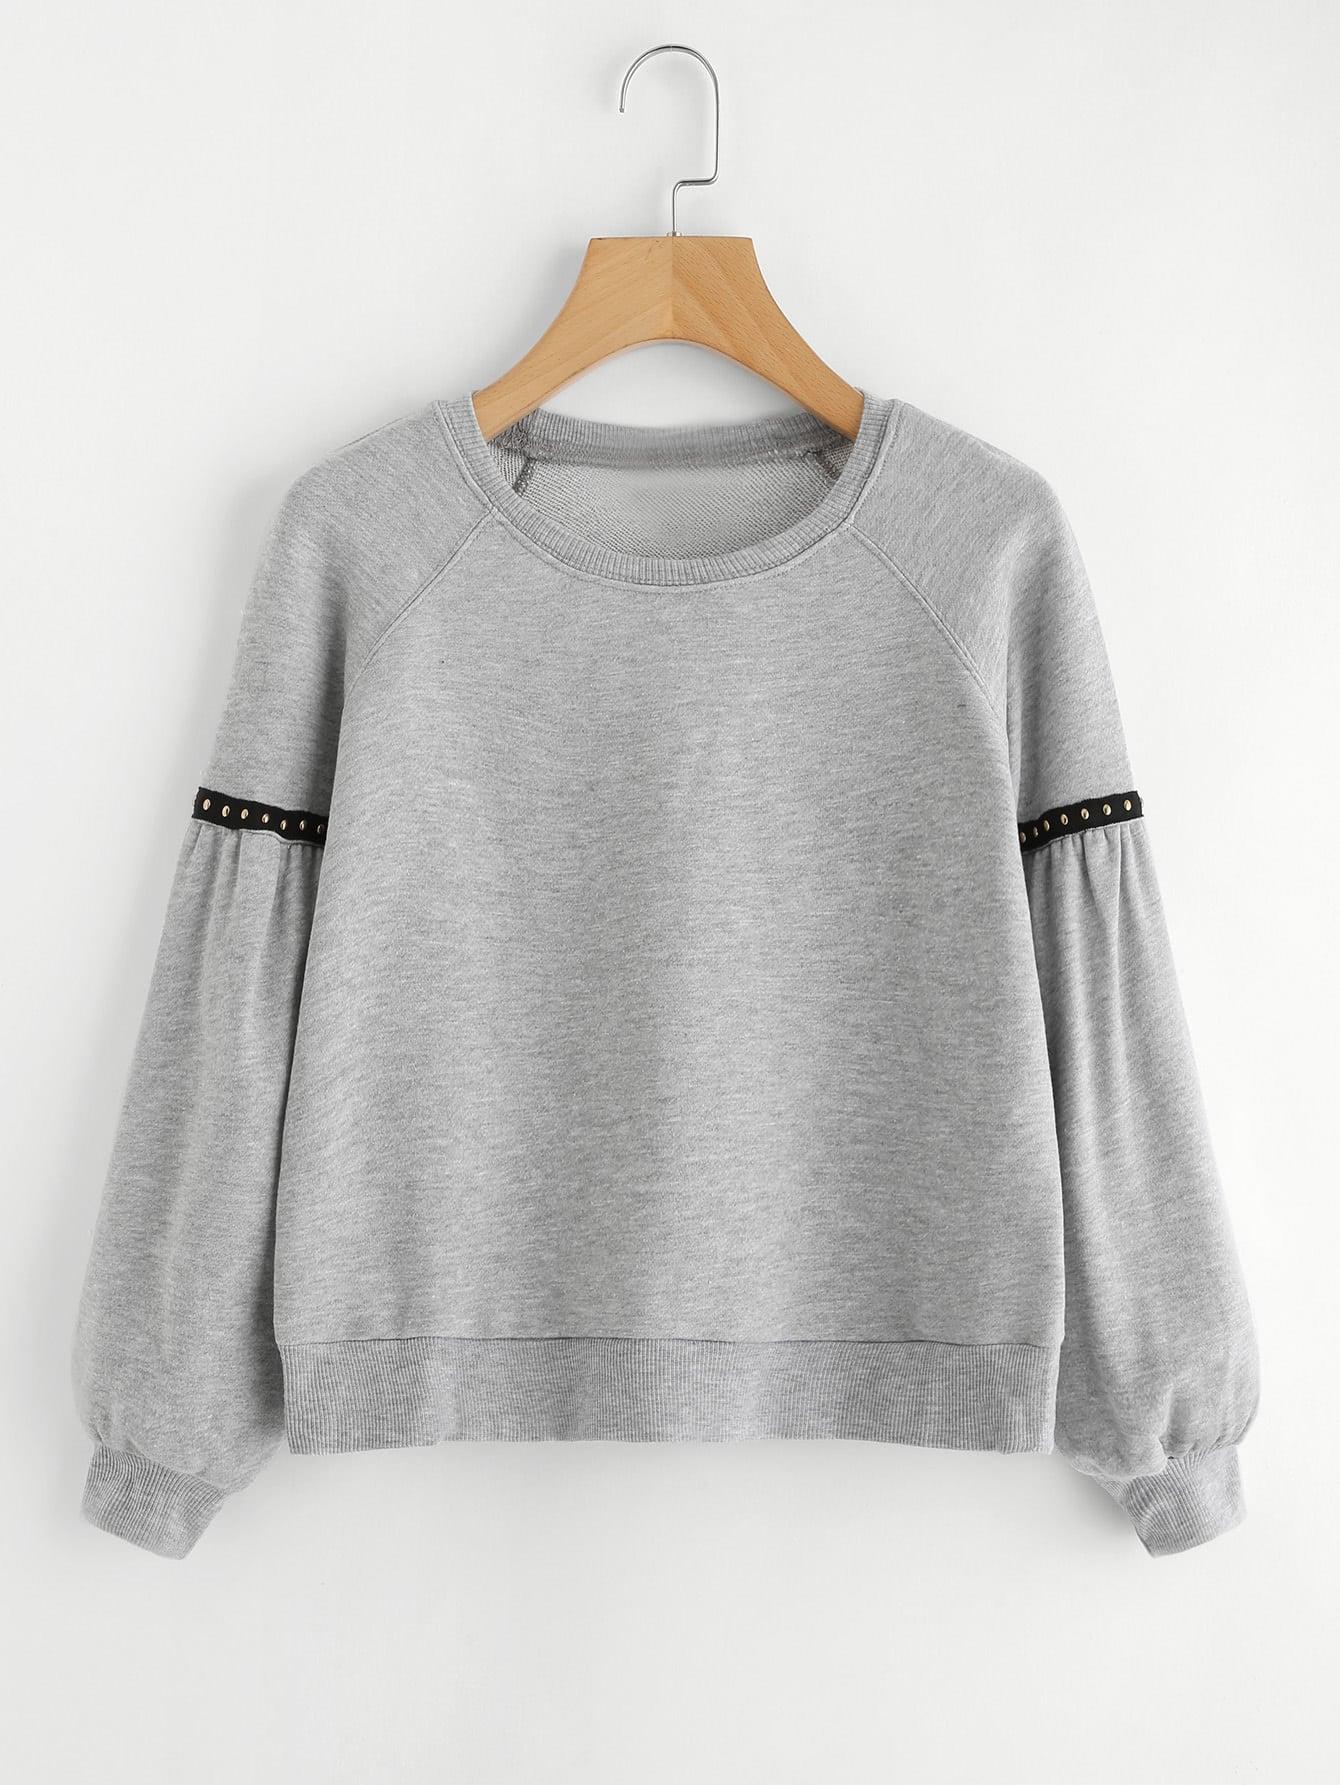 Ribbed Knit Trim Crop Sweatshirt sweatshirt170830403